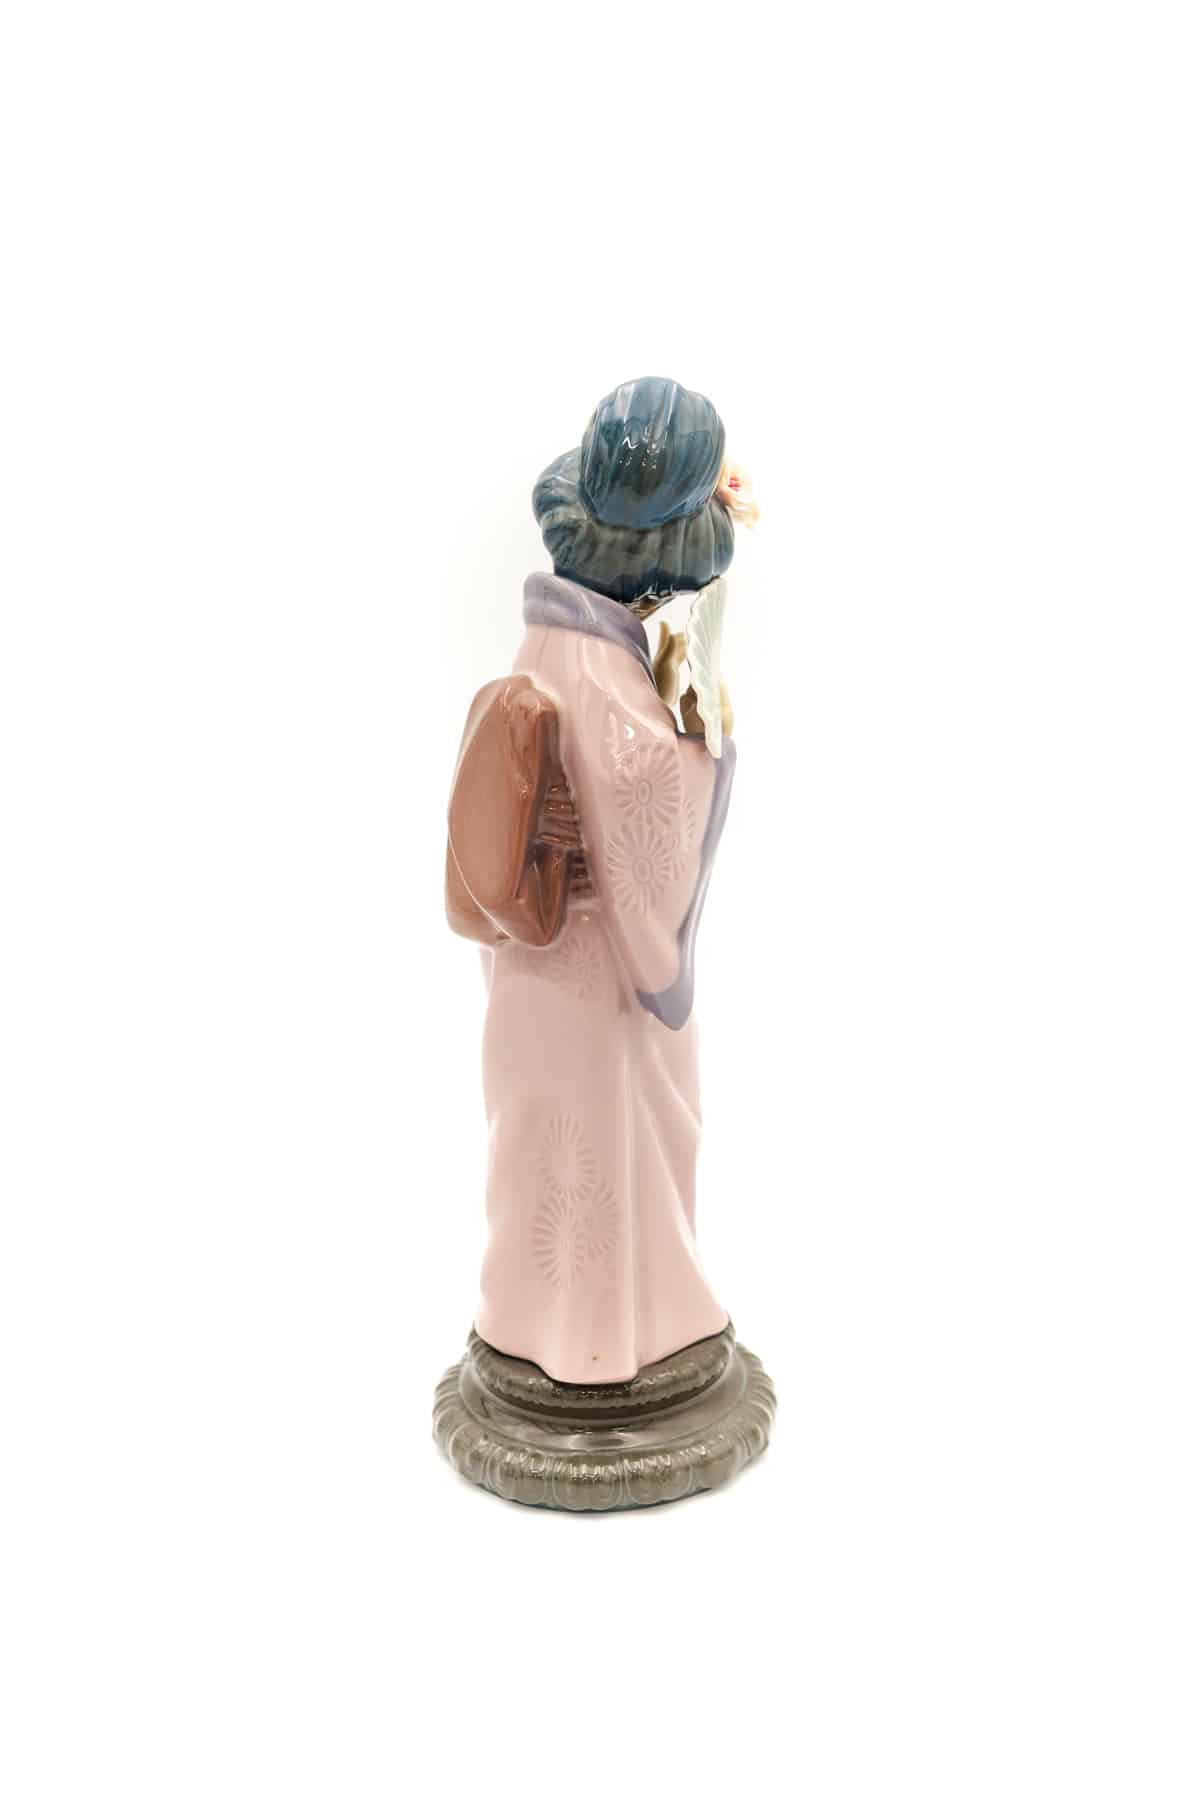 farforovaya statuetka geysha s veerom